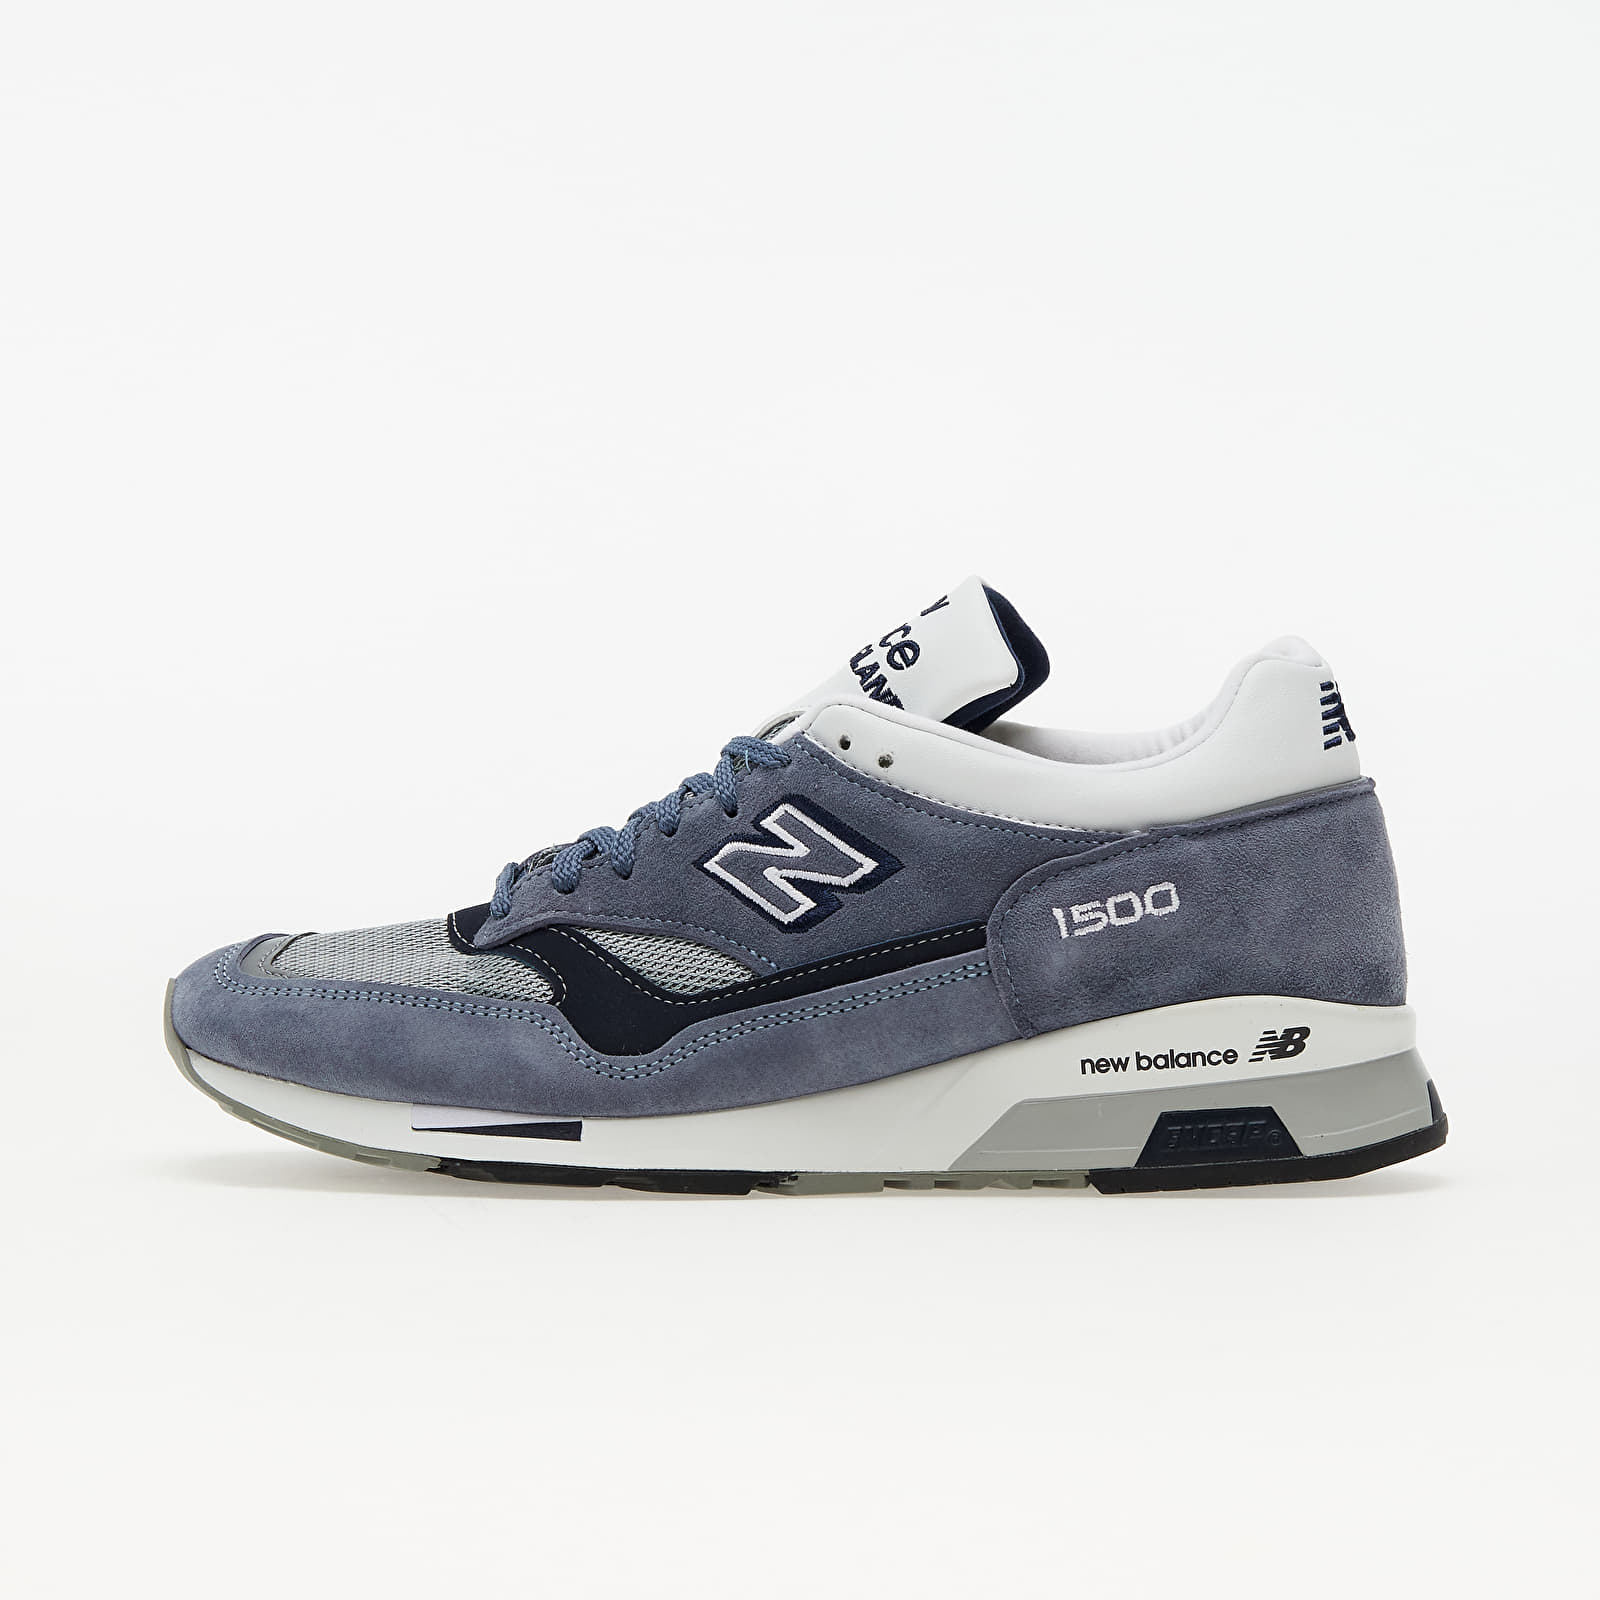 New Balance 1500 Grey   Footshop